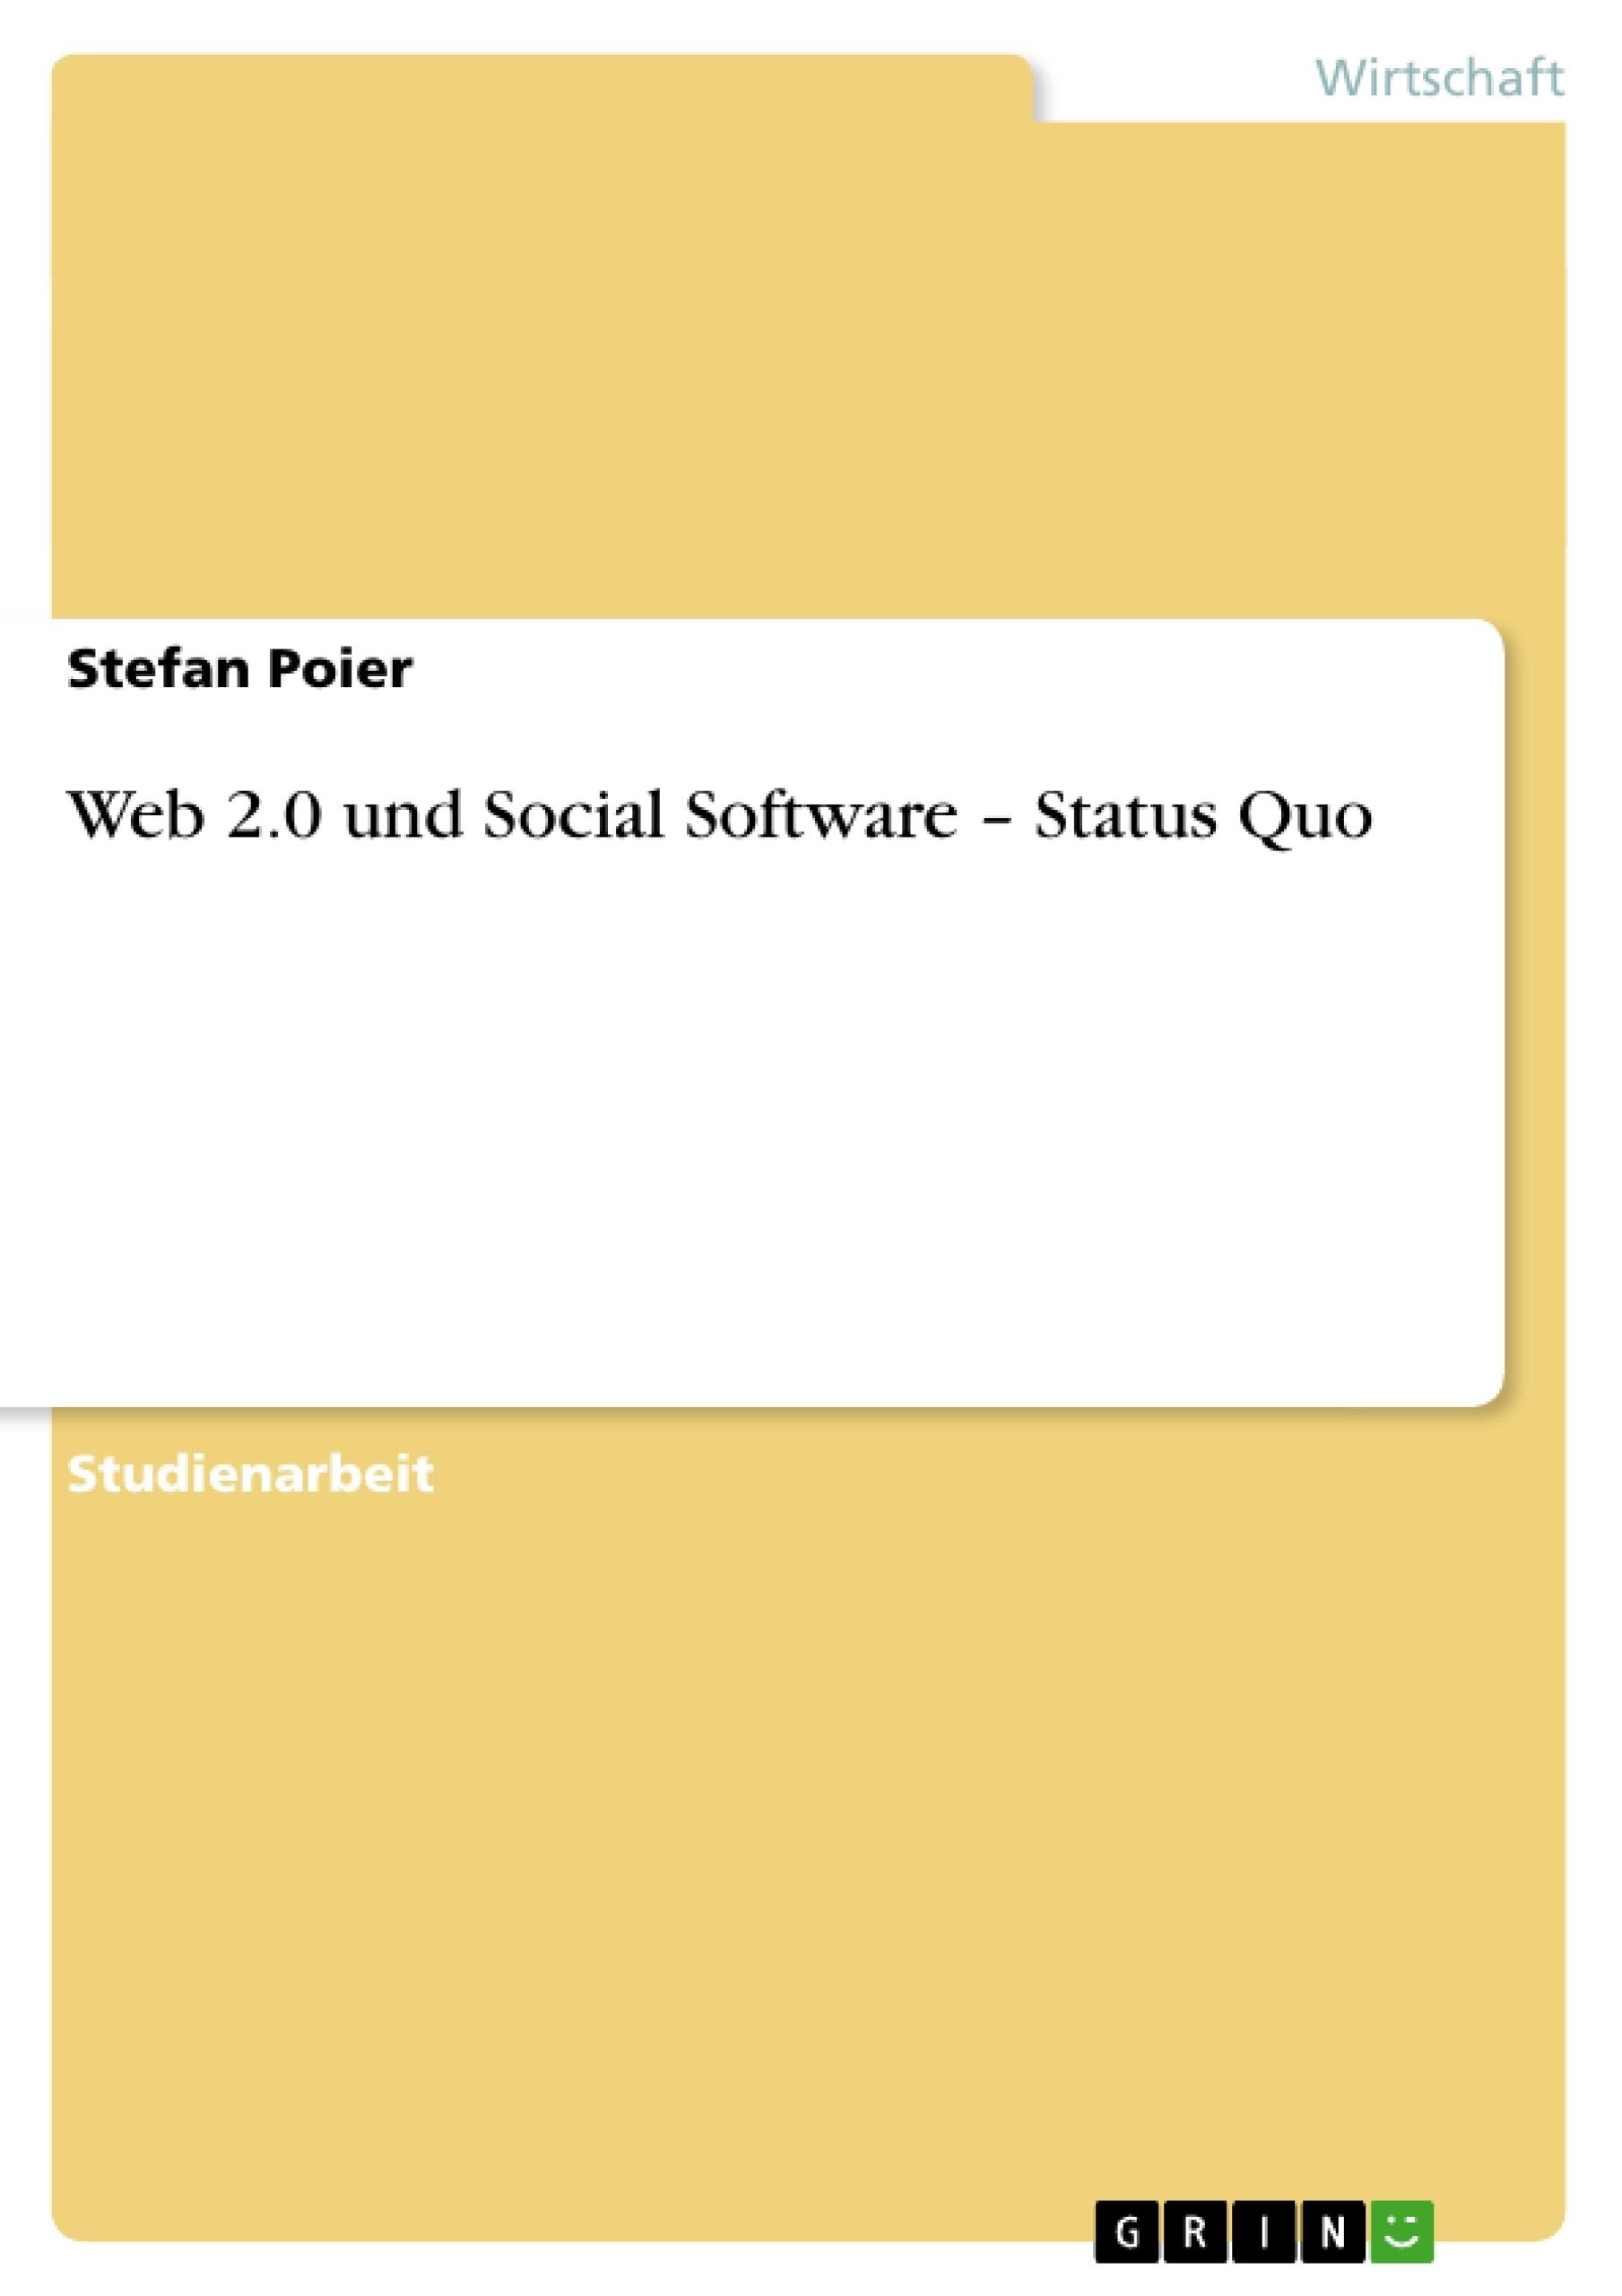 Titel: Web 2.0 und Social Software – Status Quo